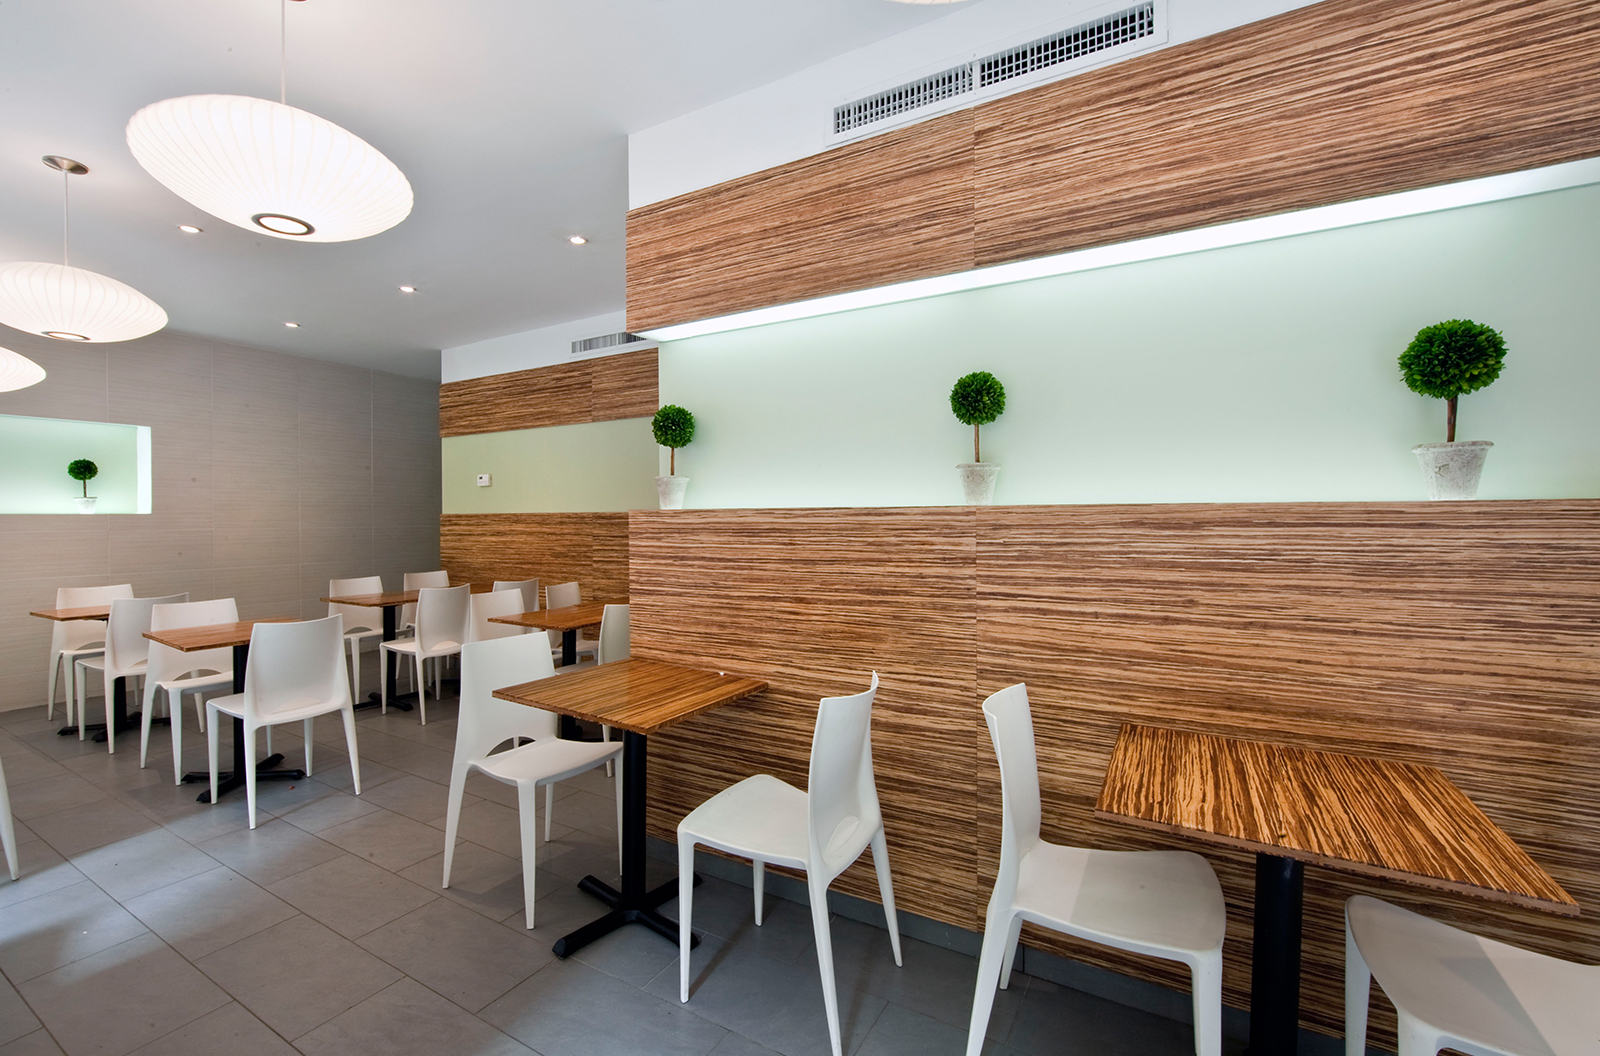 Calista Mandarina Studio NYC Healthy Food restaurant Design_3.jpg